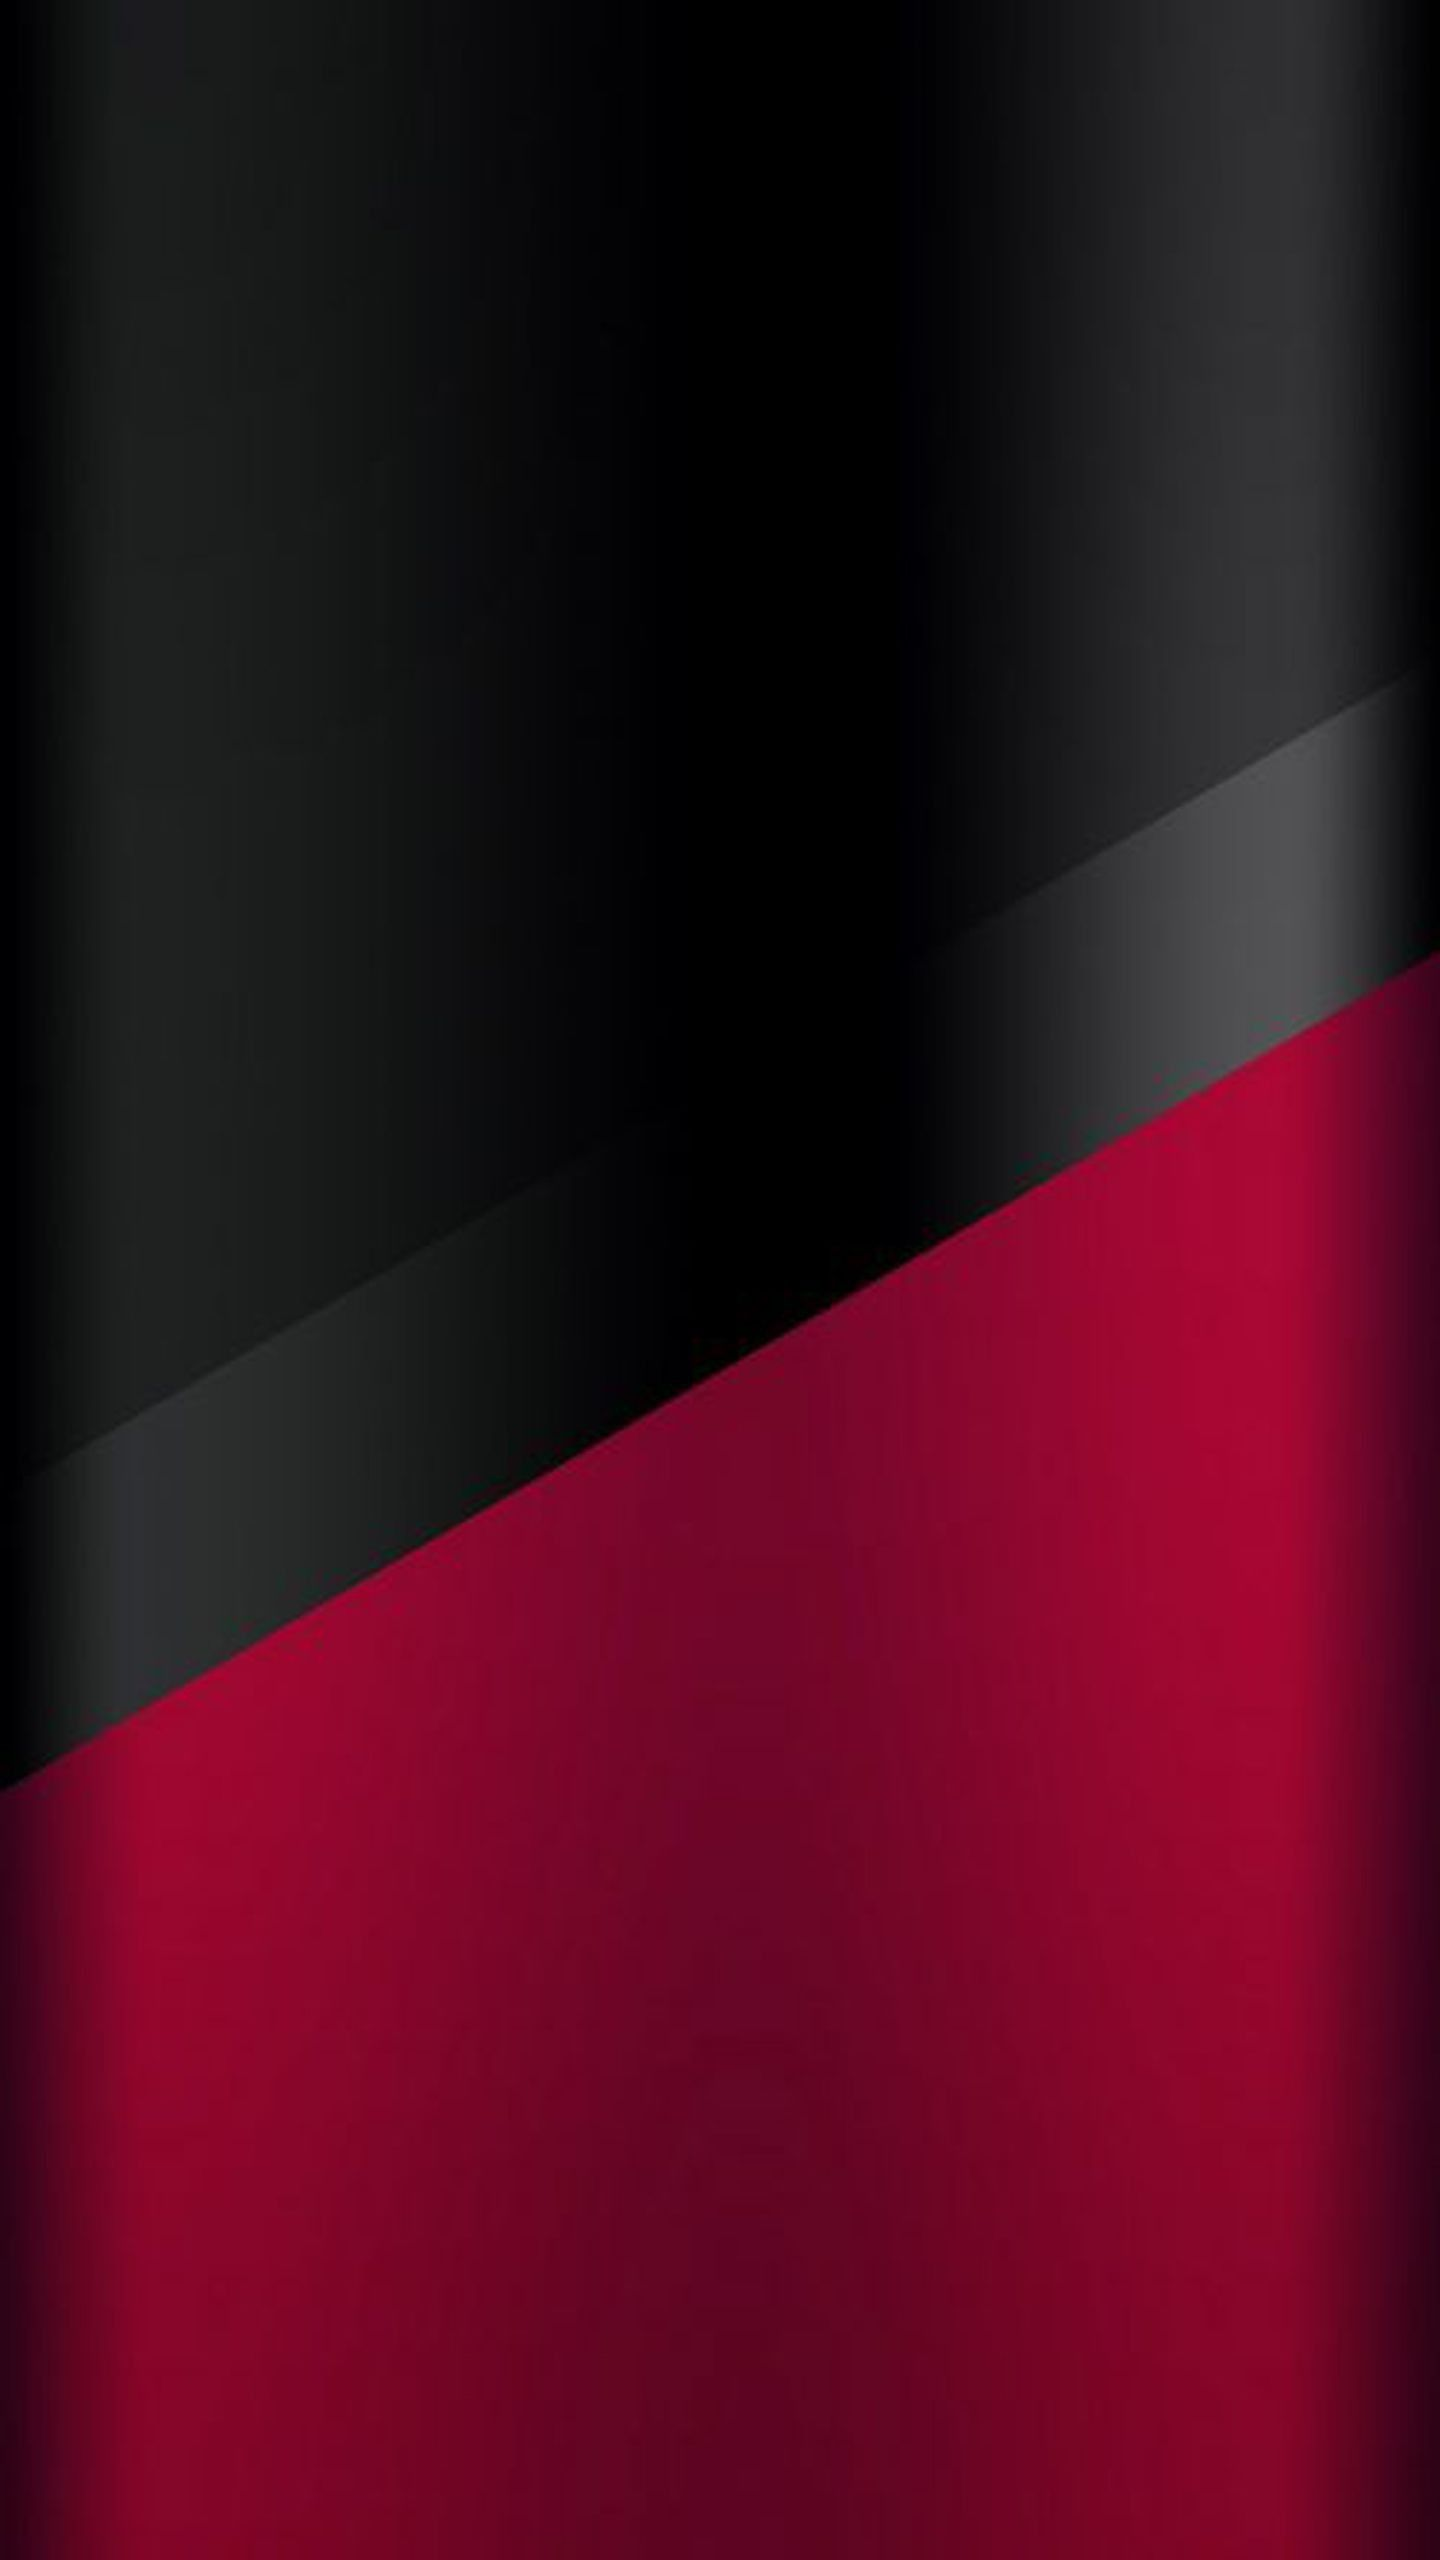 Awesome Samsung S8 Plus Wallpaper Full Hd Wallpaper Ponsel Desain Latar Belakang